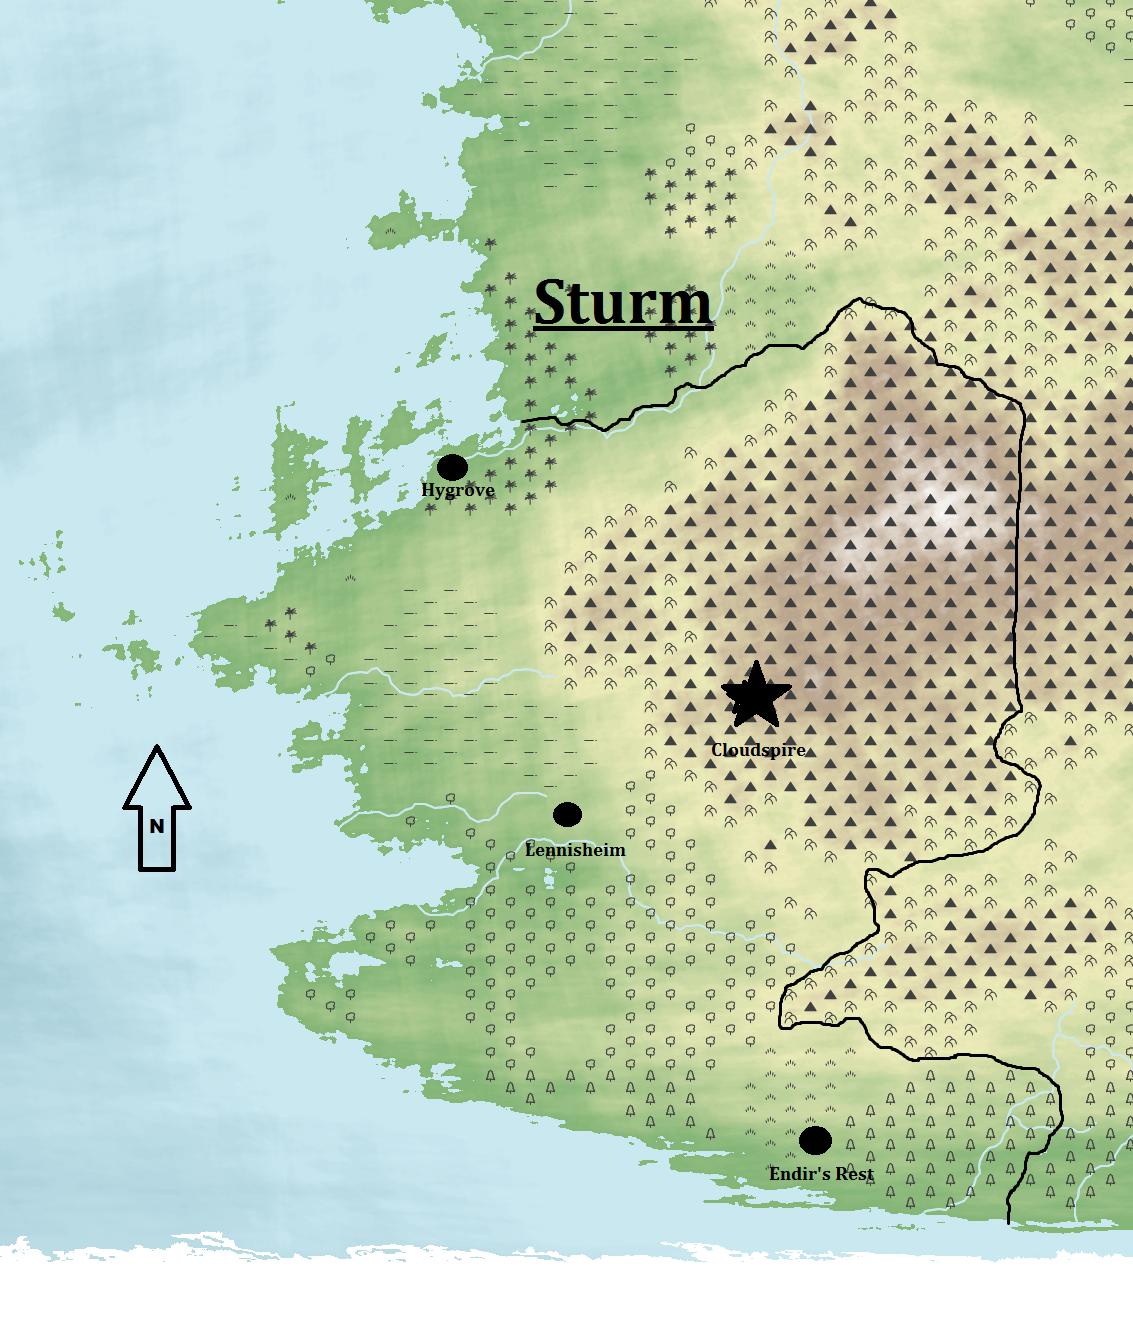 Sturm_bordered.png